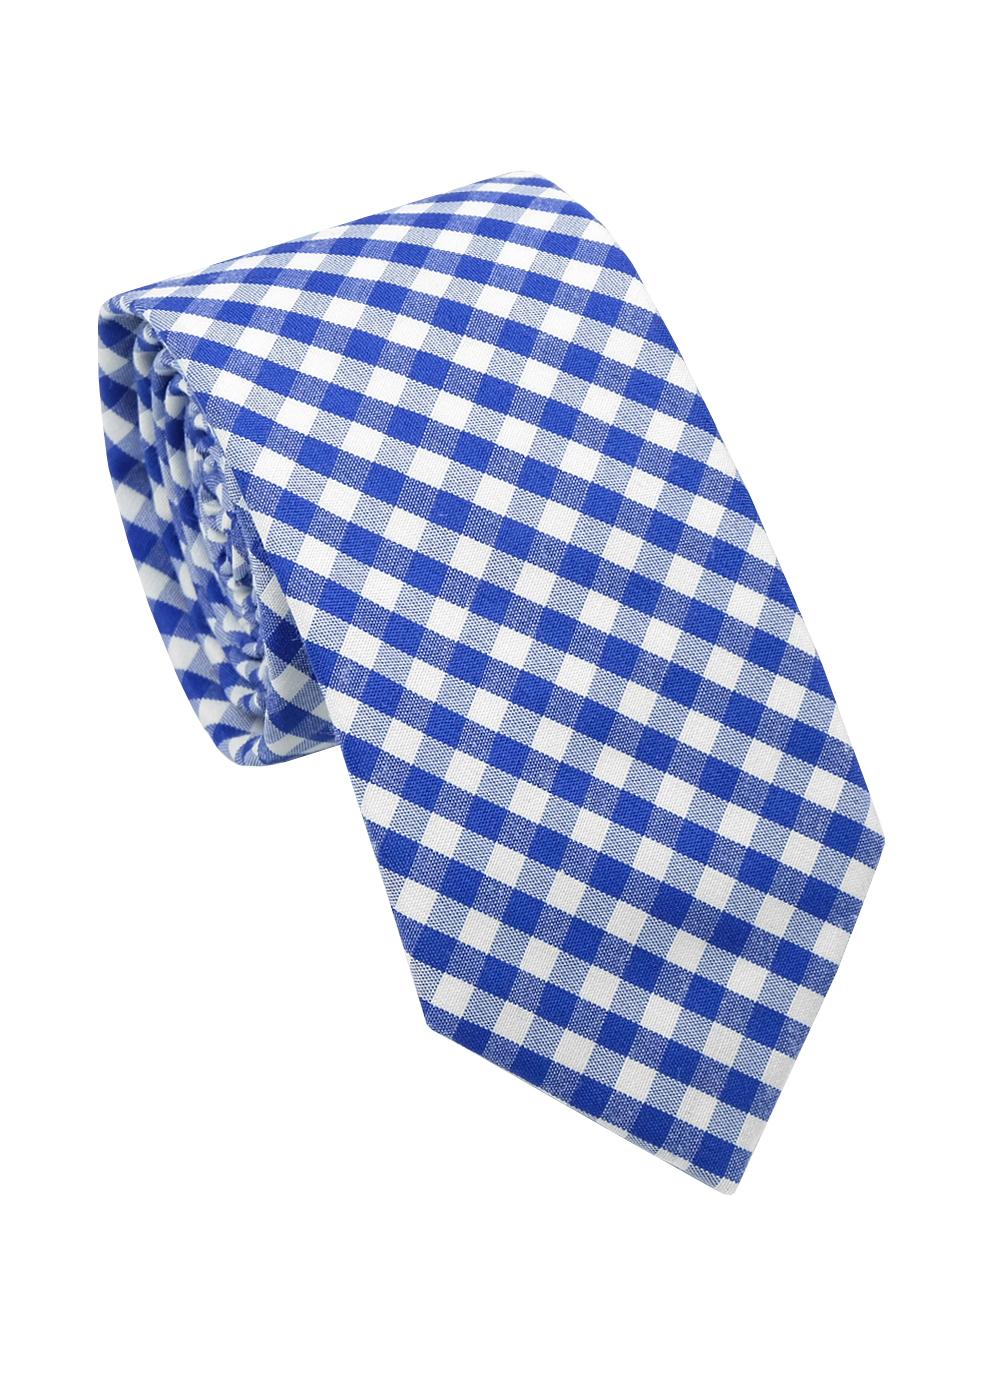 Club Room NEW Green Tartan Plaid Silk Woven Men/'s Pattern Pocket Square $32 253